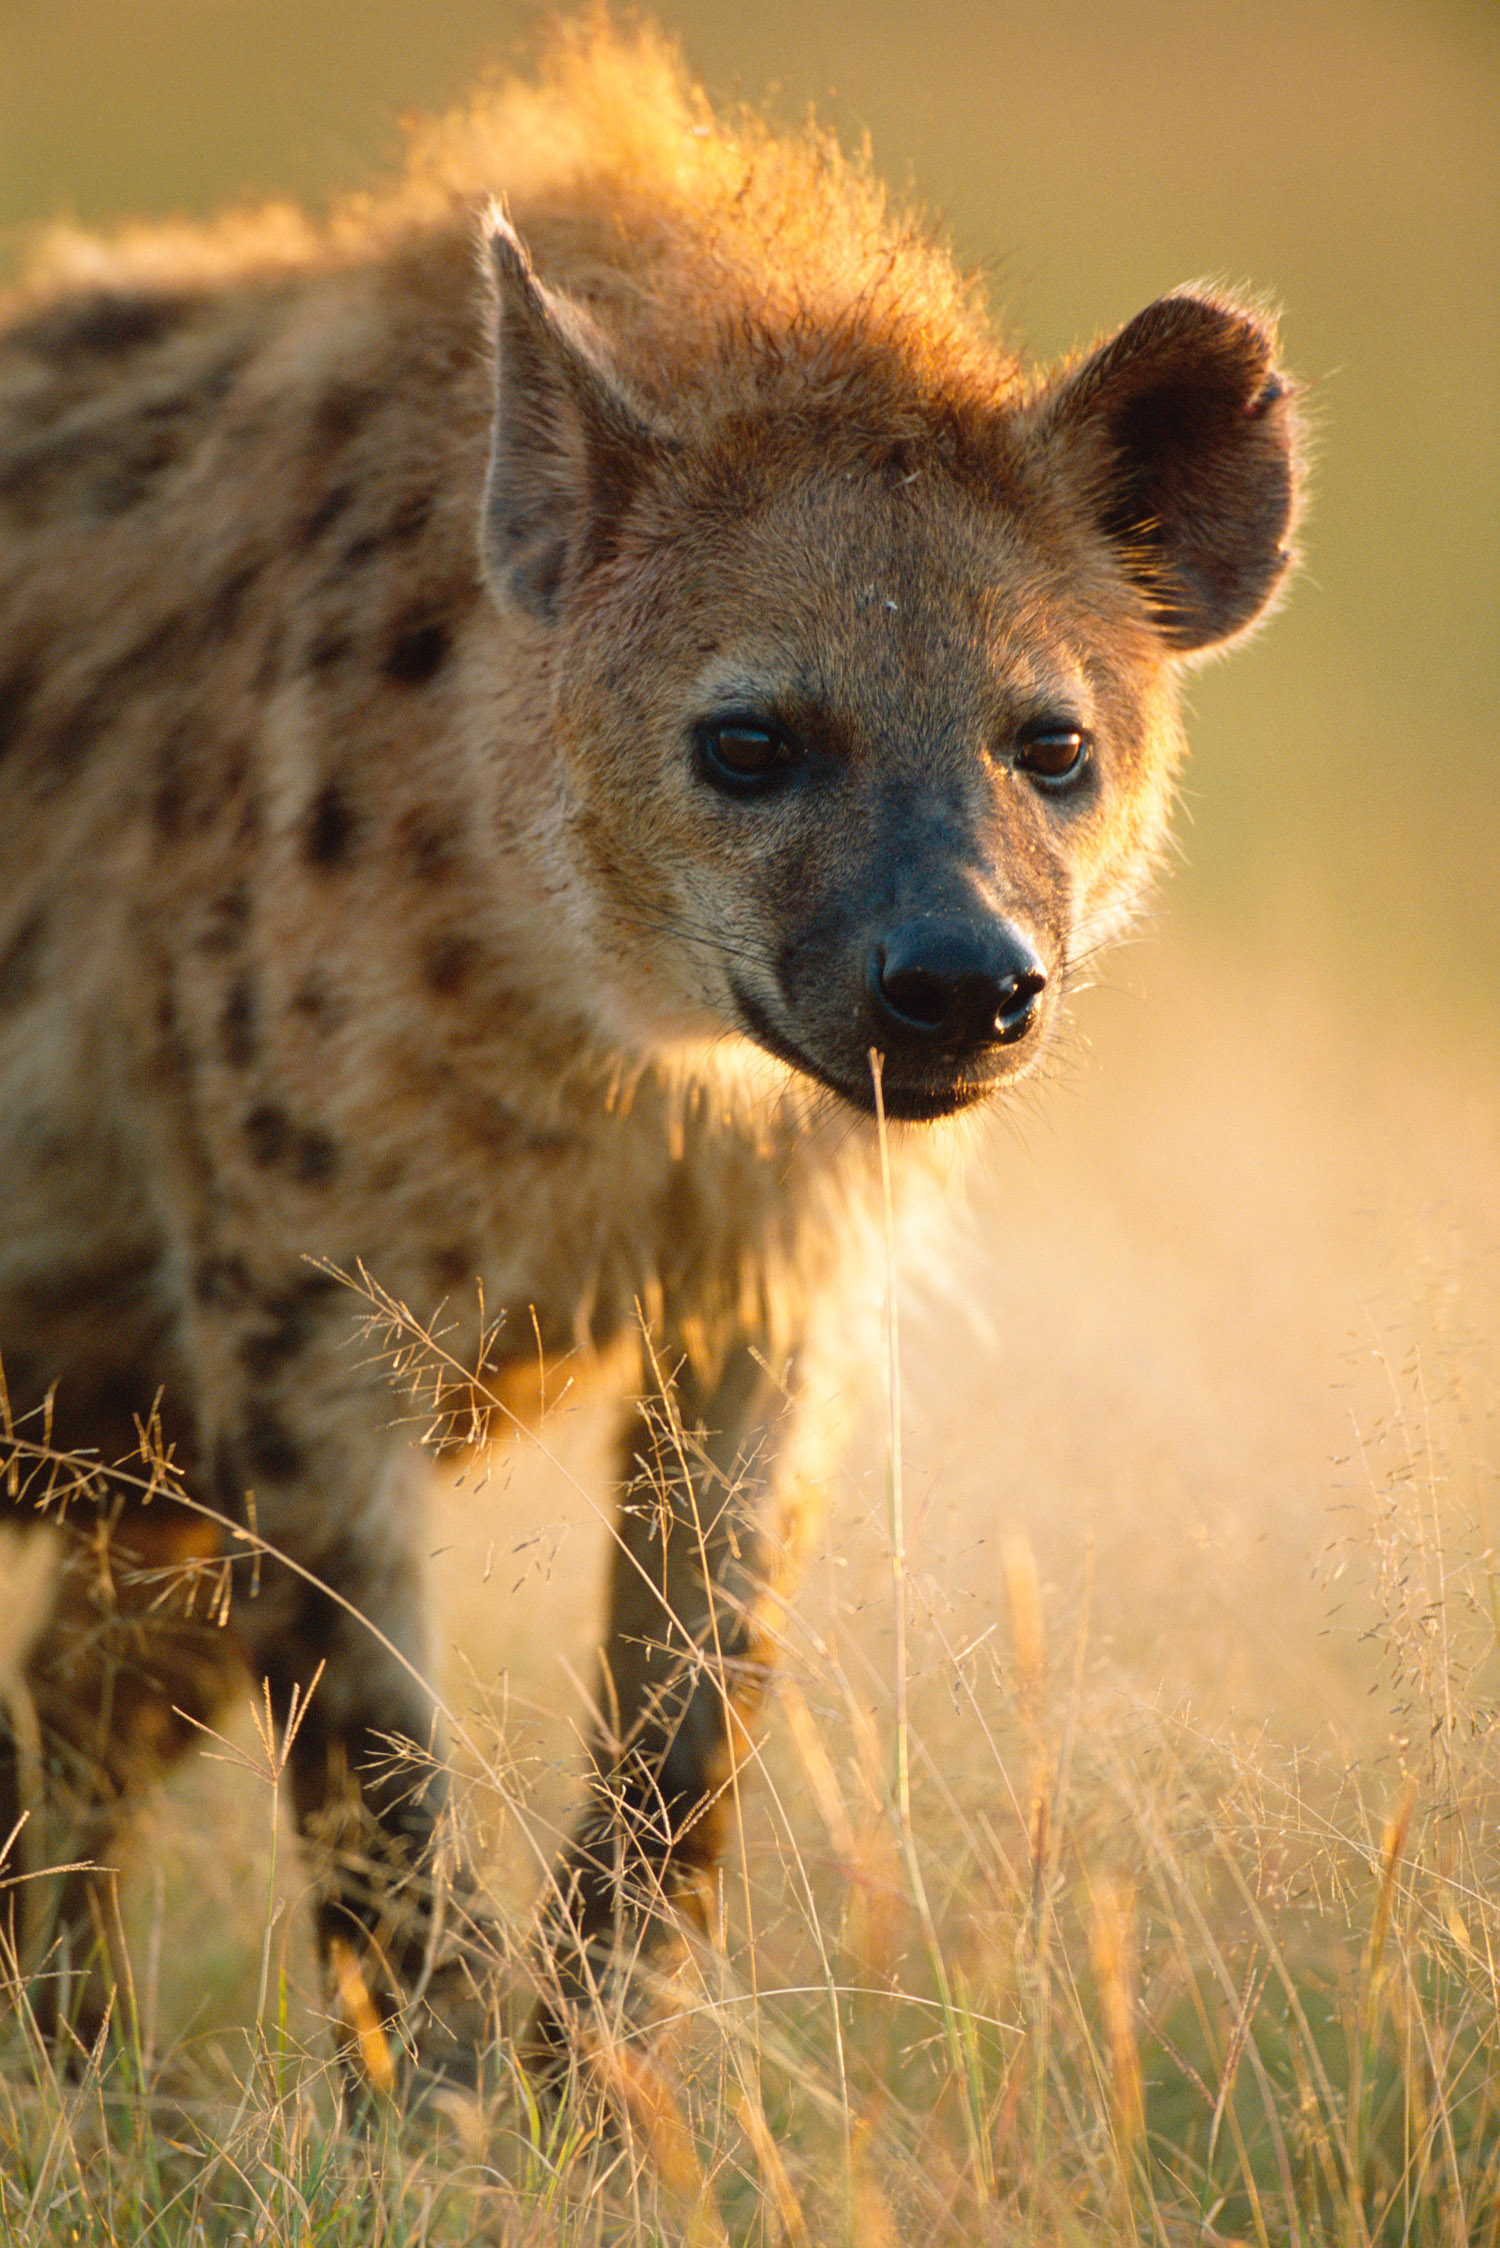 Spotted hyaena approaching, Masai Mara National Reserve, Kenya